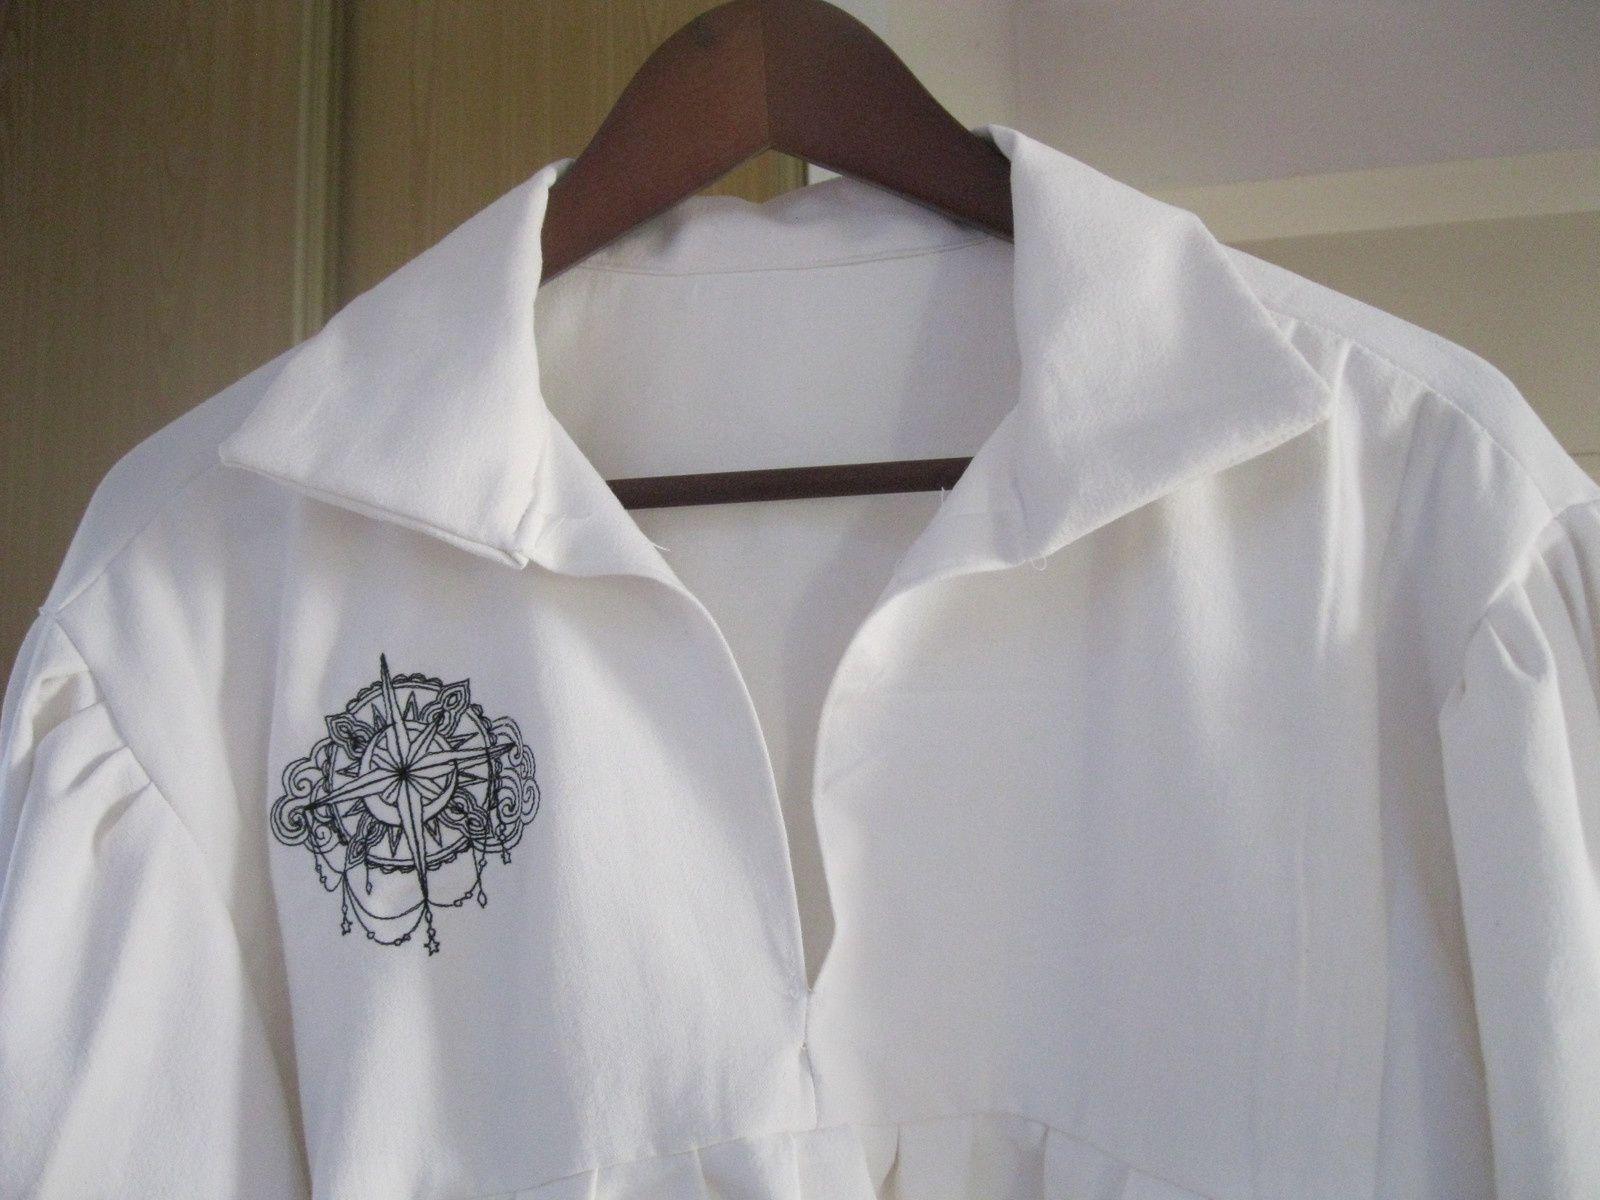 Manteau pirate n°3 et chemise